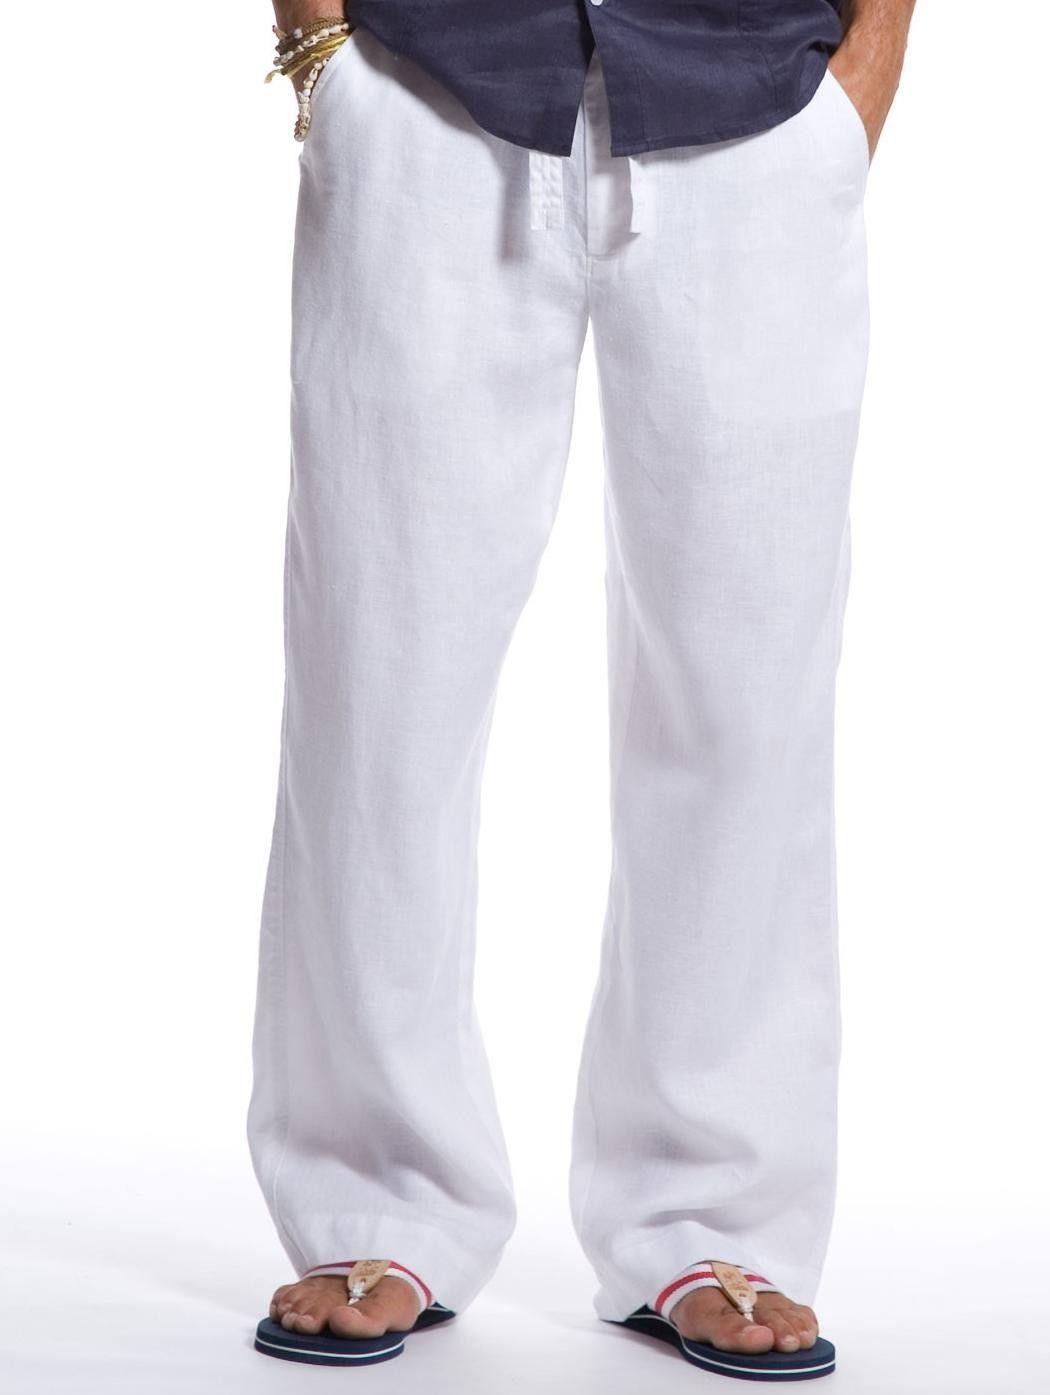 Beachcomber Linen Pants White Linen Pants For Men Island Company